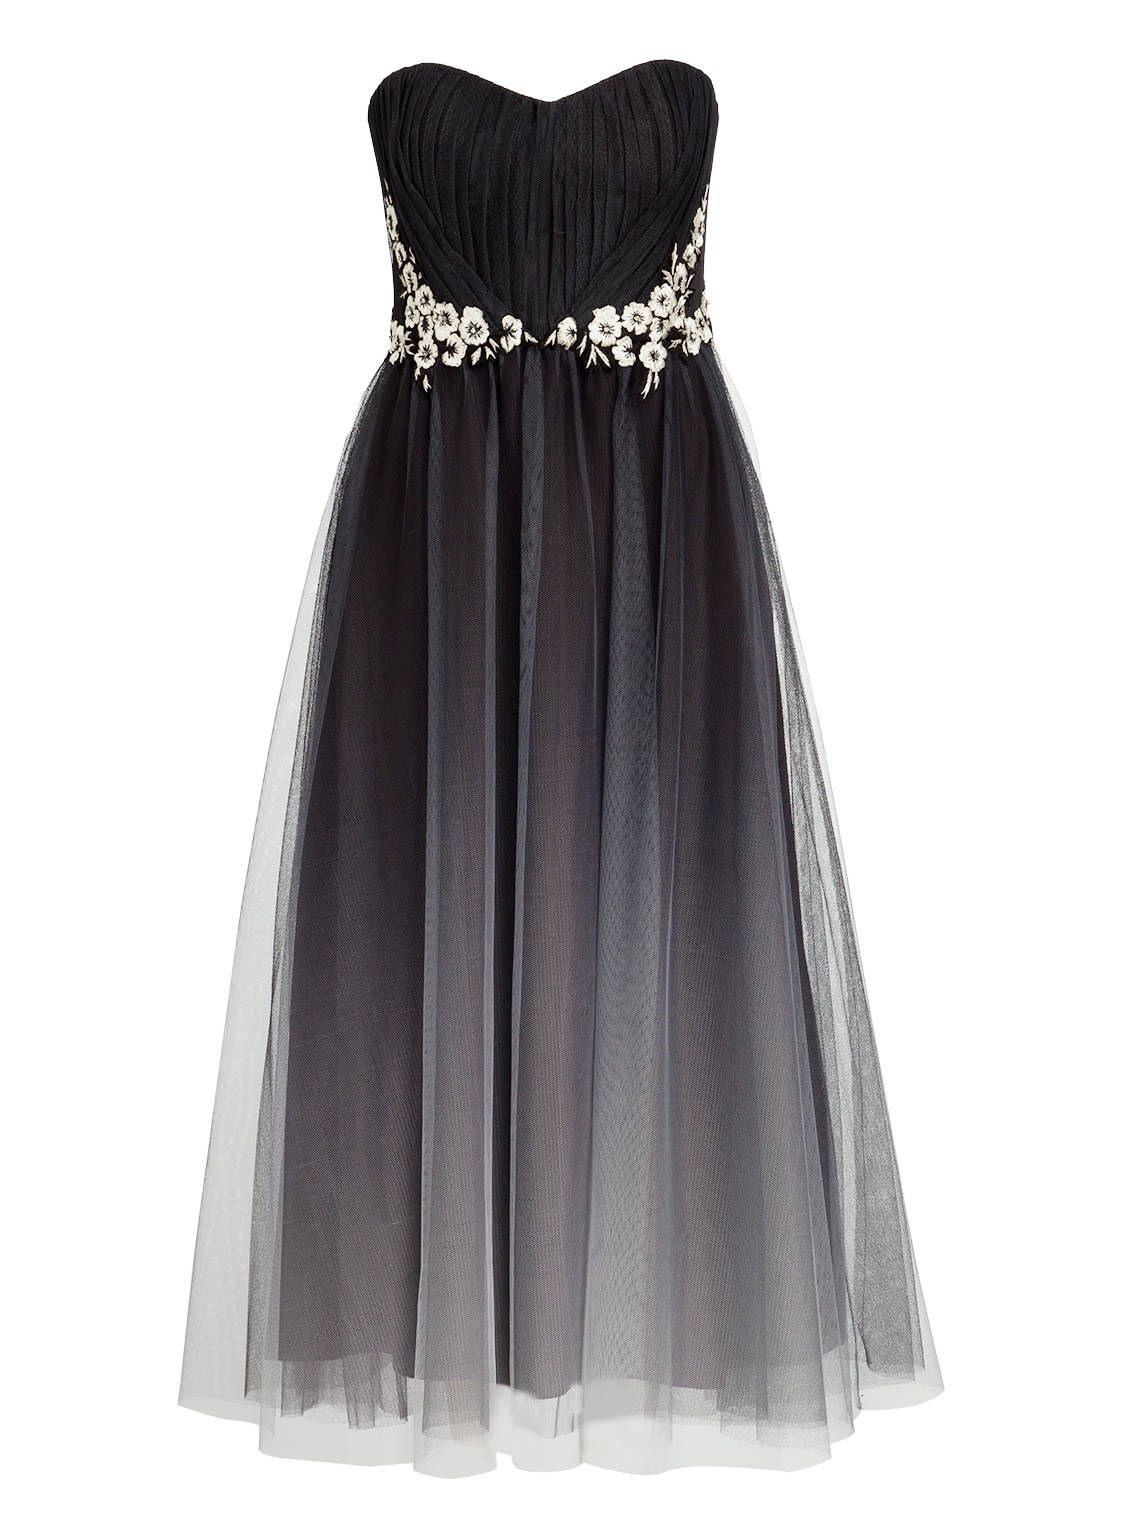 Perfekt Abendkleid Breuninger StylishAbend Genial Abendkleid Breuninger Stylish